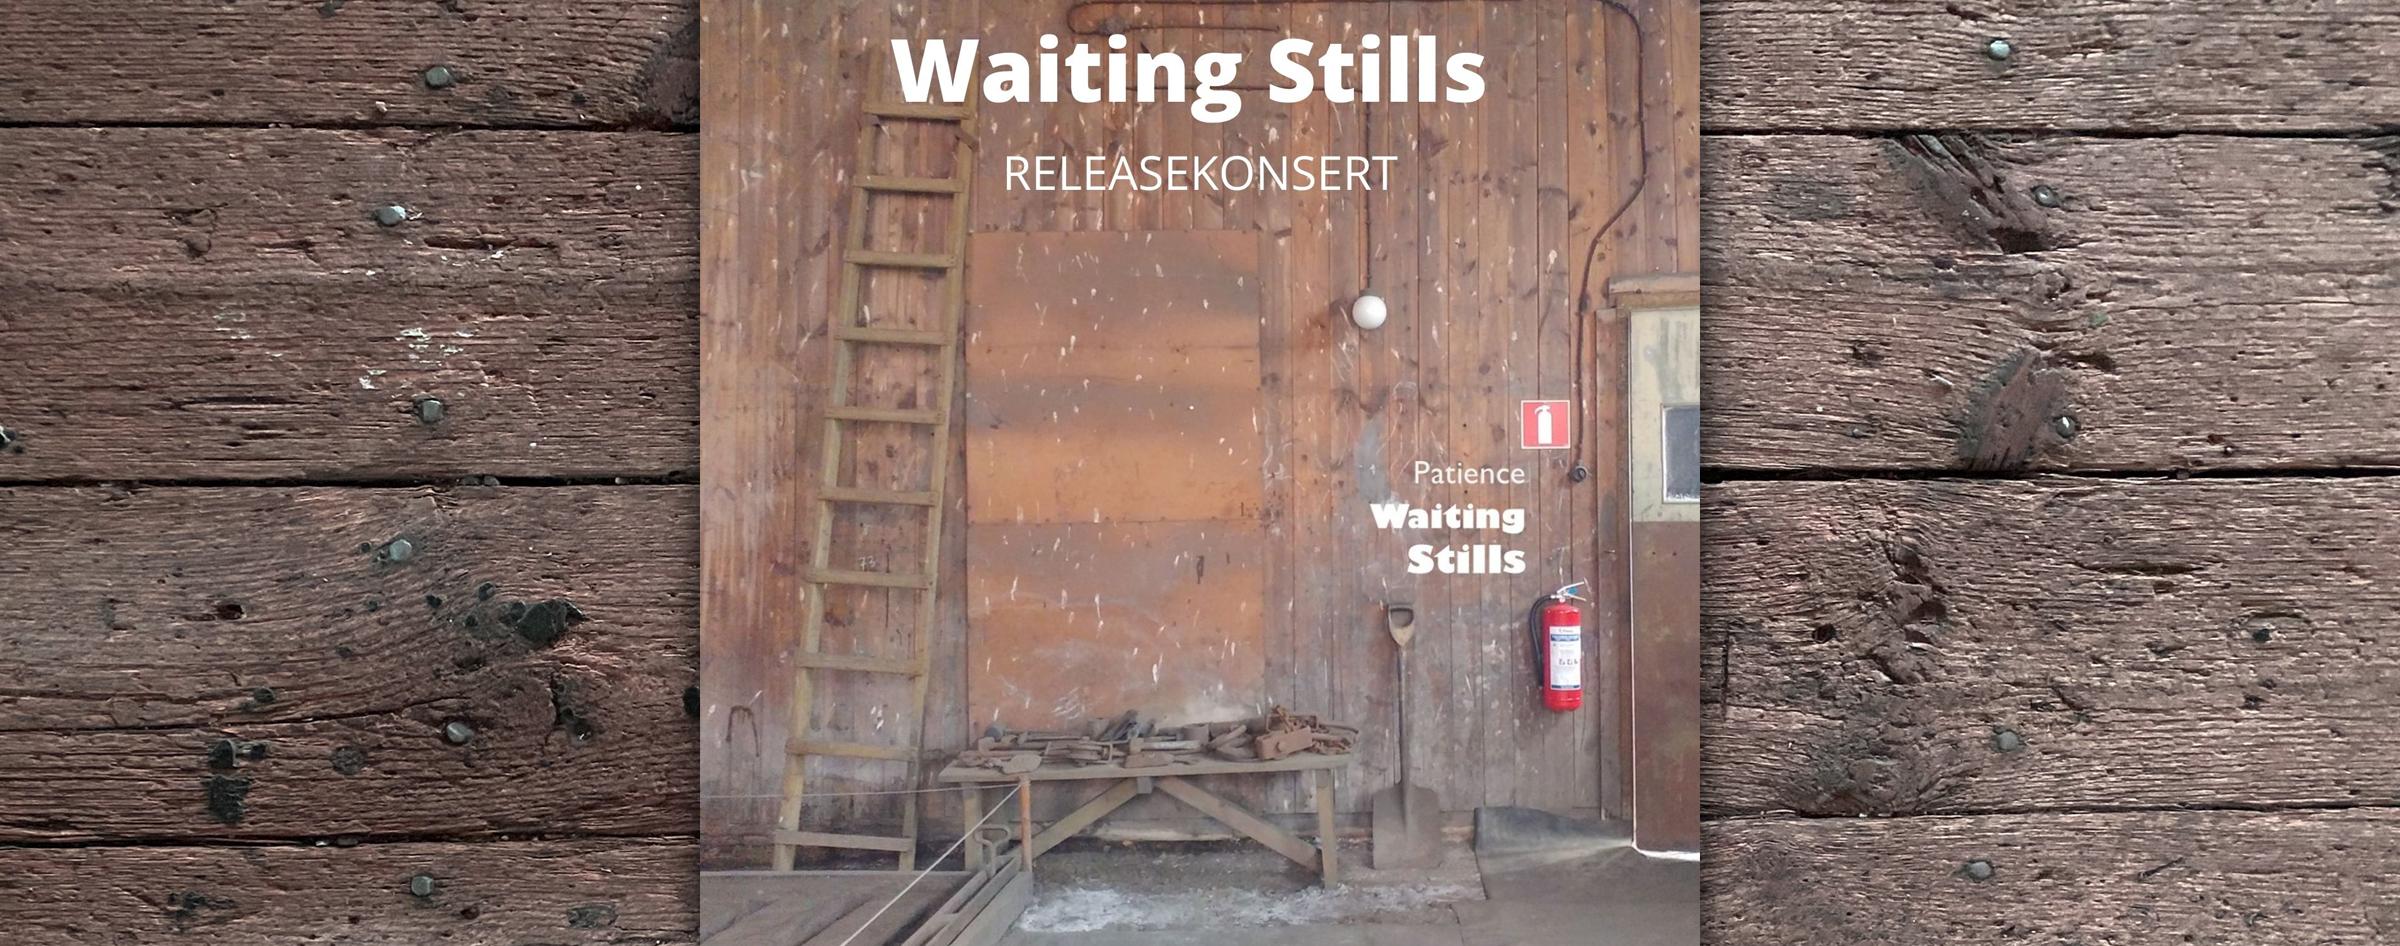 Waiting Stills